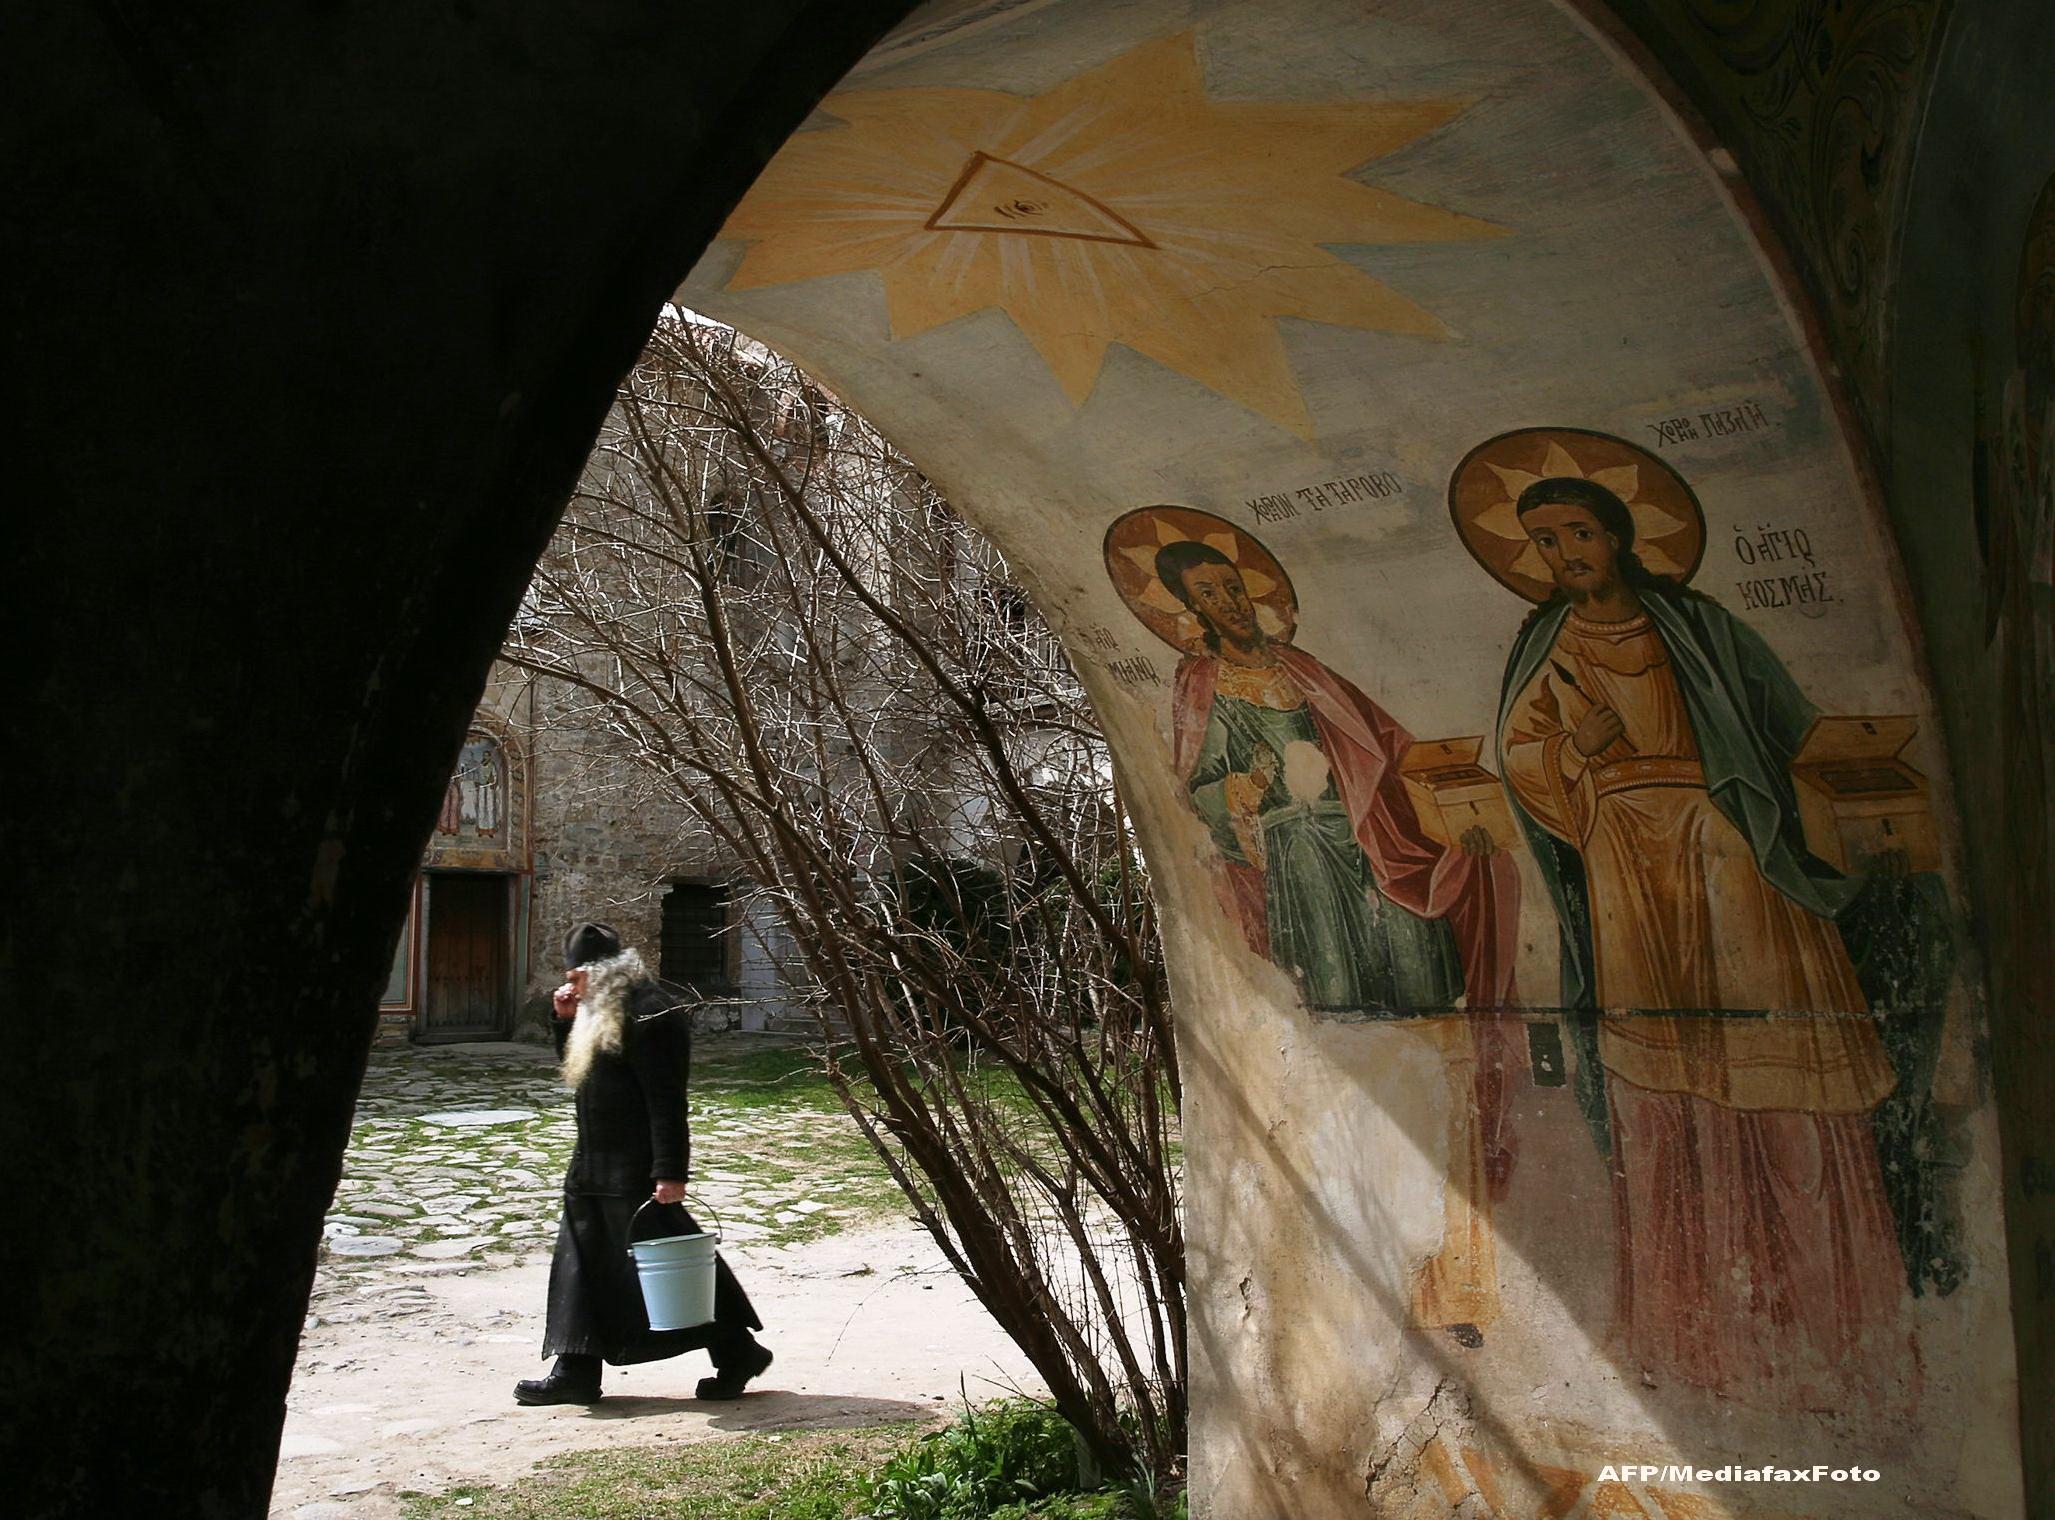 Salvatorii imbracati in negru. LECTIA DE VIATA a unor calugari italieni, data unei comunitati din Maramures